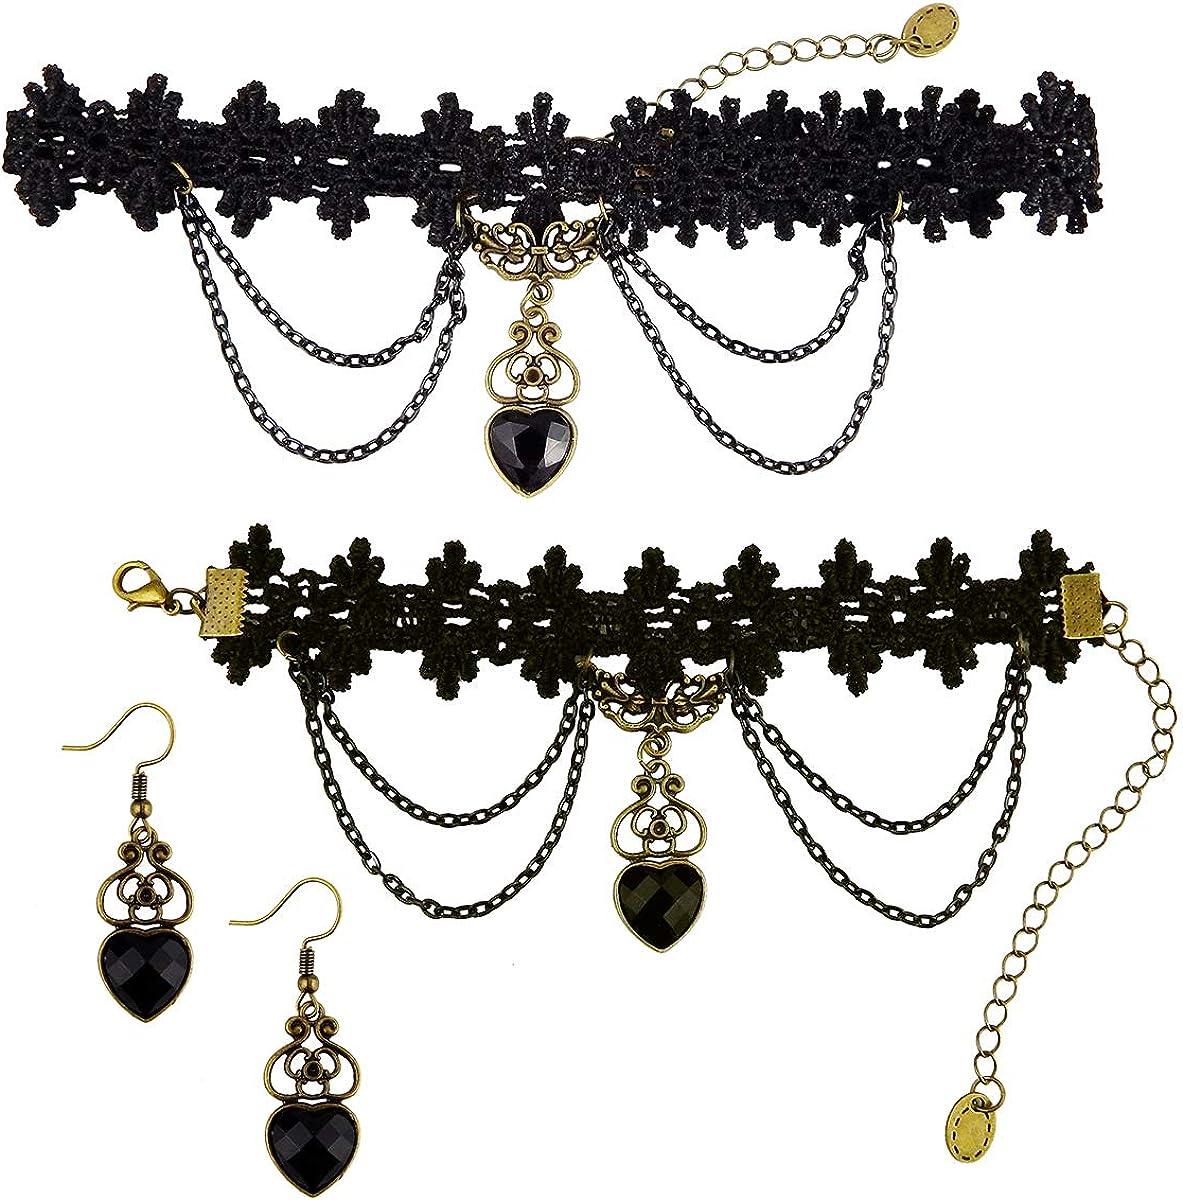 Vintage Crystal Rhinestone Chocker Necklace Party Club Punk Gothic Necklace New